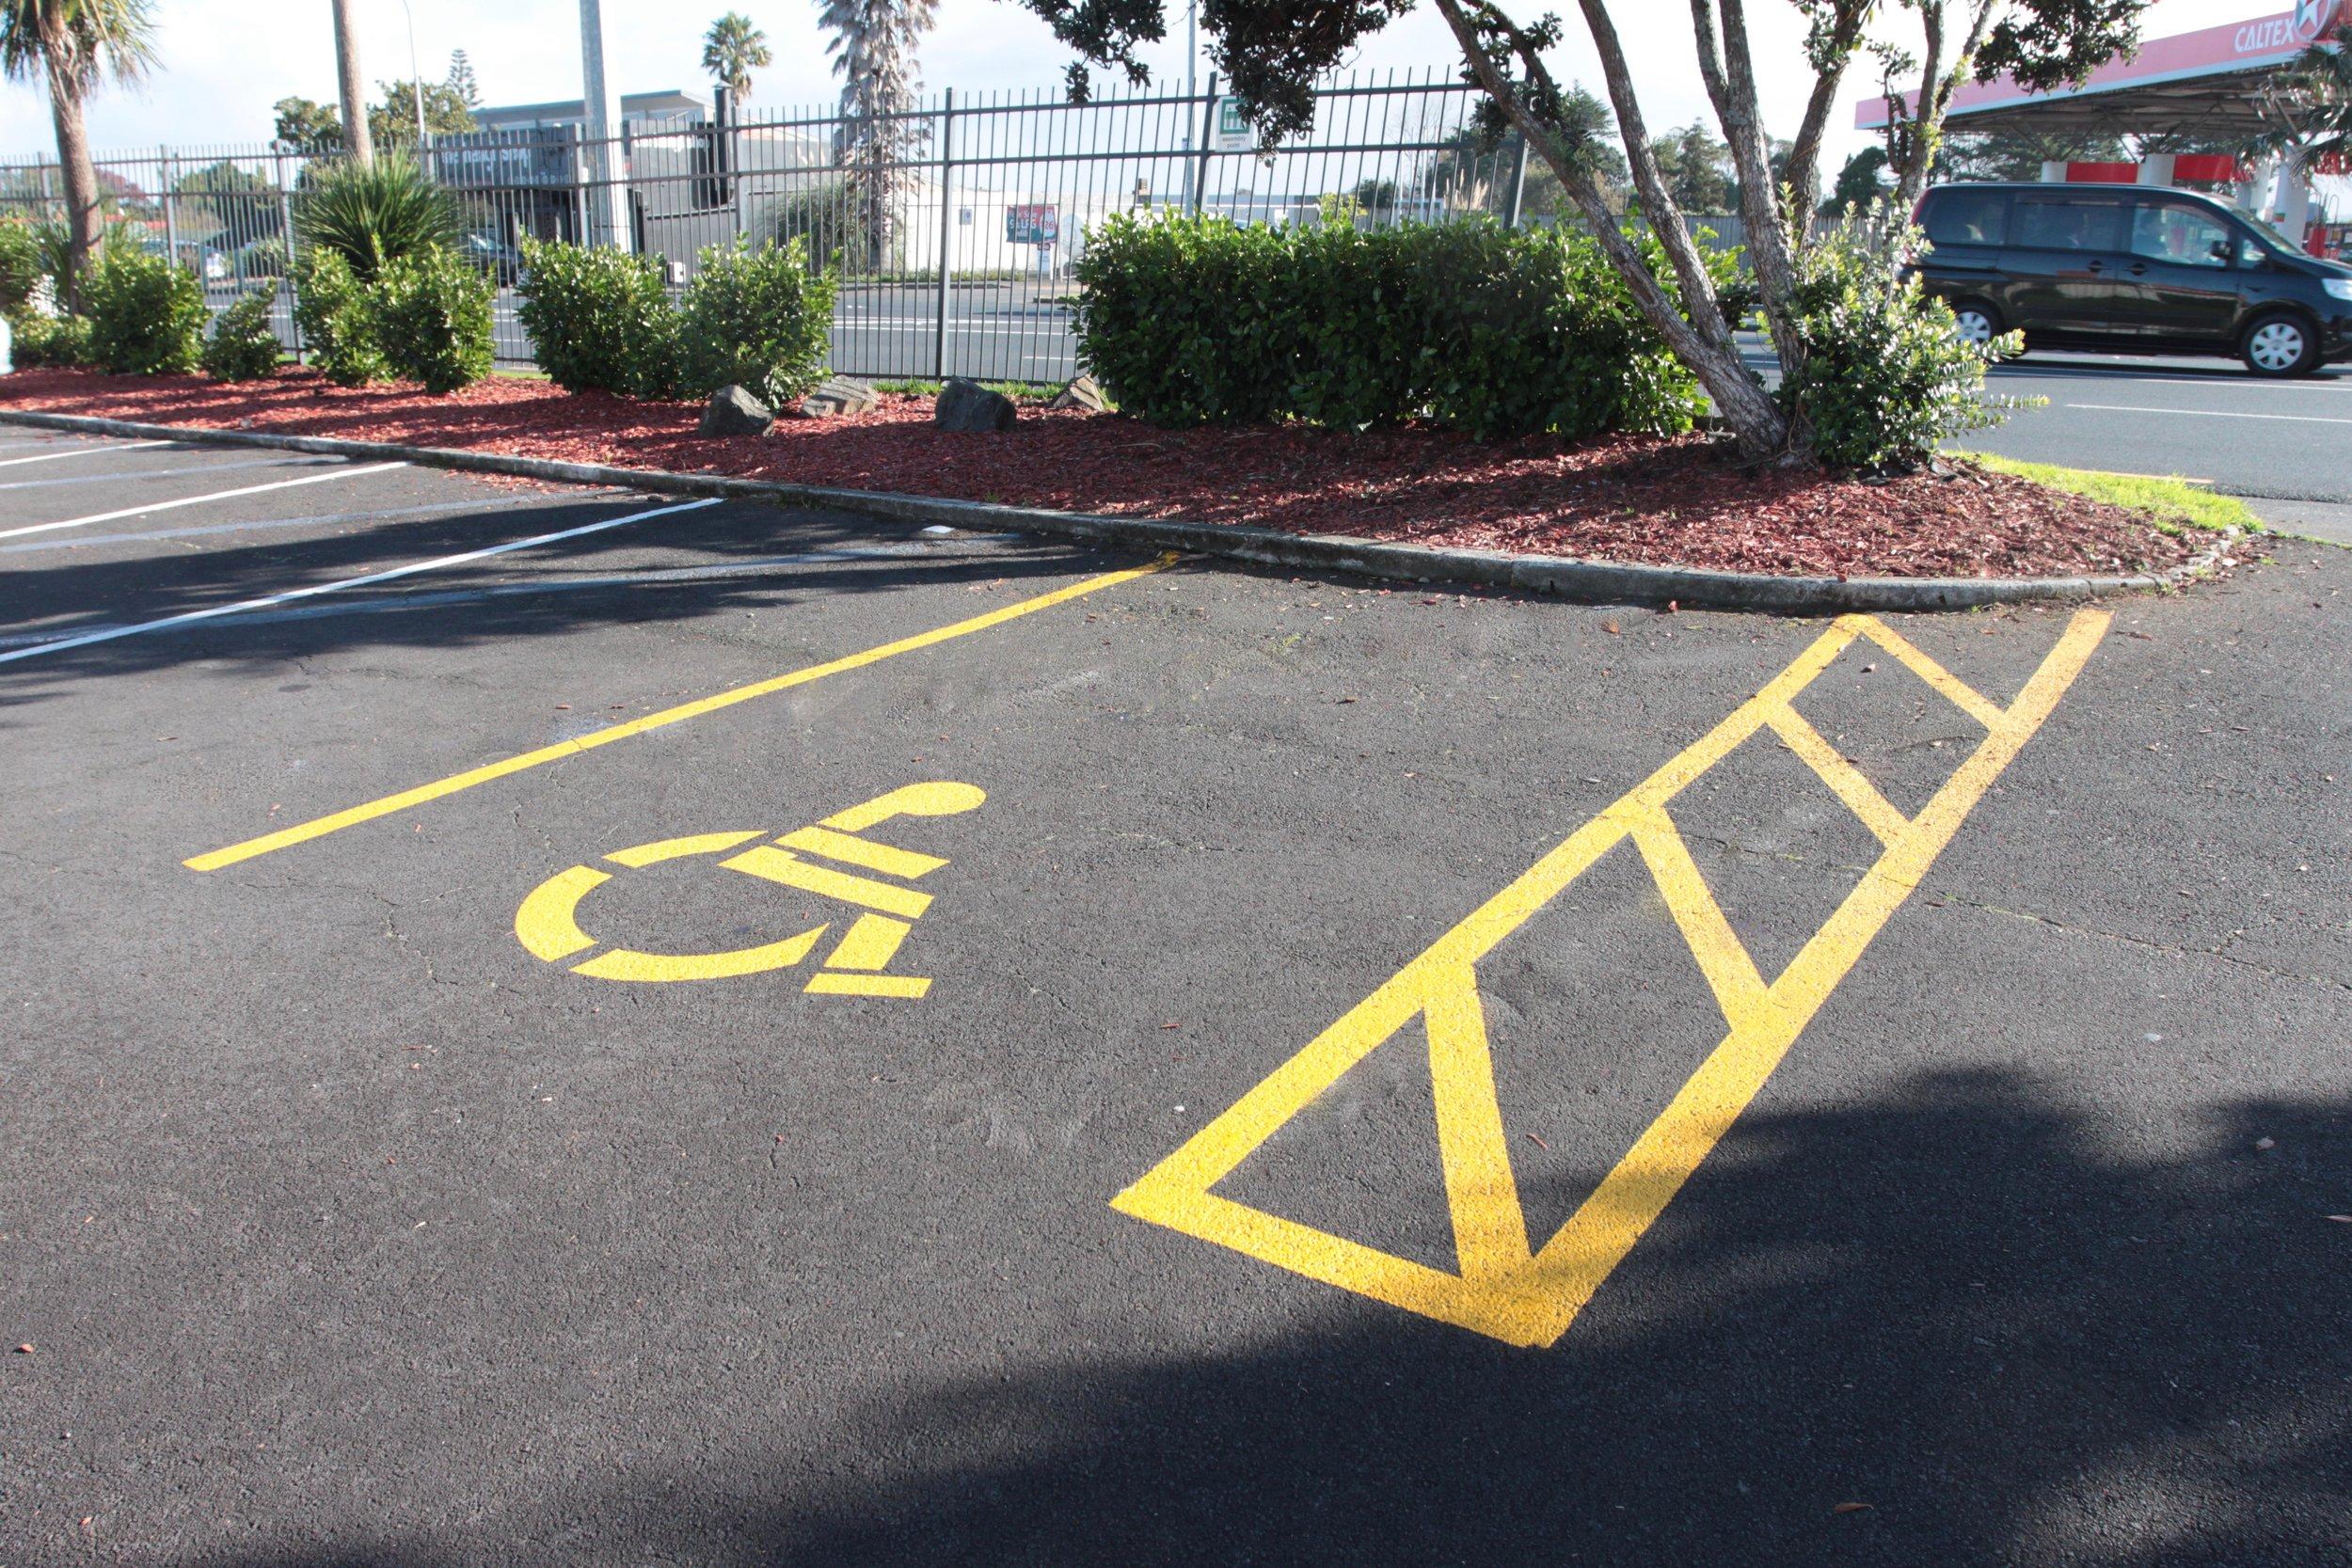 Car Park Carpark Disabled Yellow Lines Cross Hatch